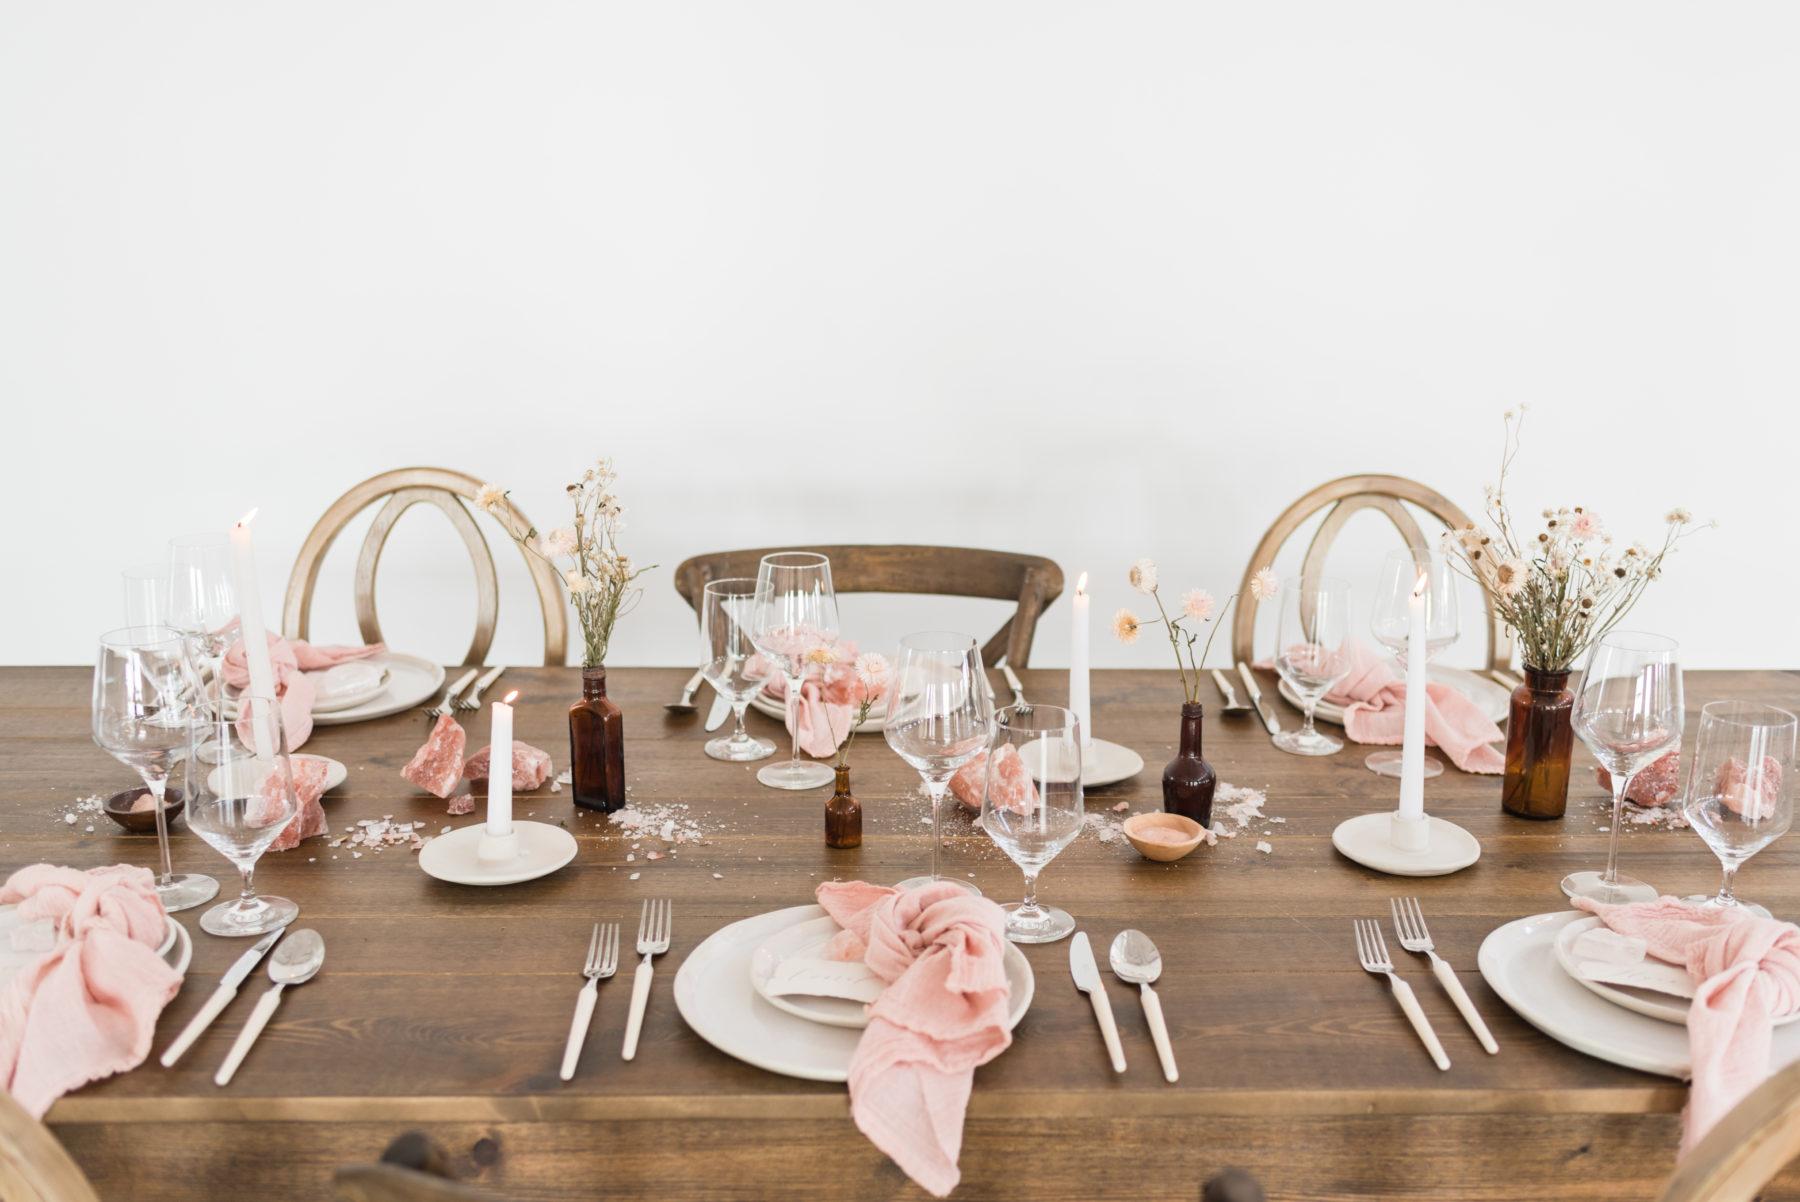 Natural Wedding Table Decor: Organic Blush Wedding Inspiration captured by Mandy Liz Photography